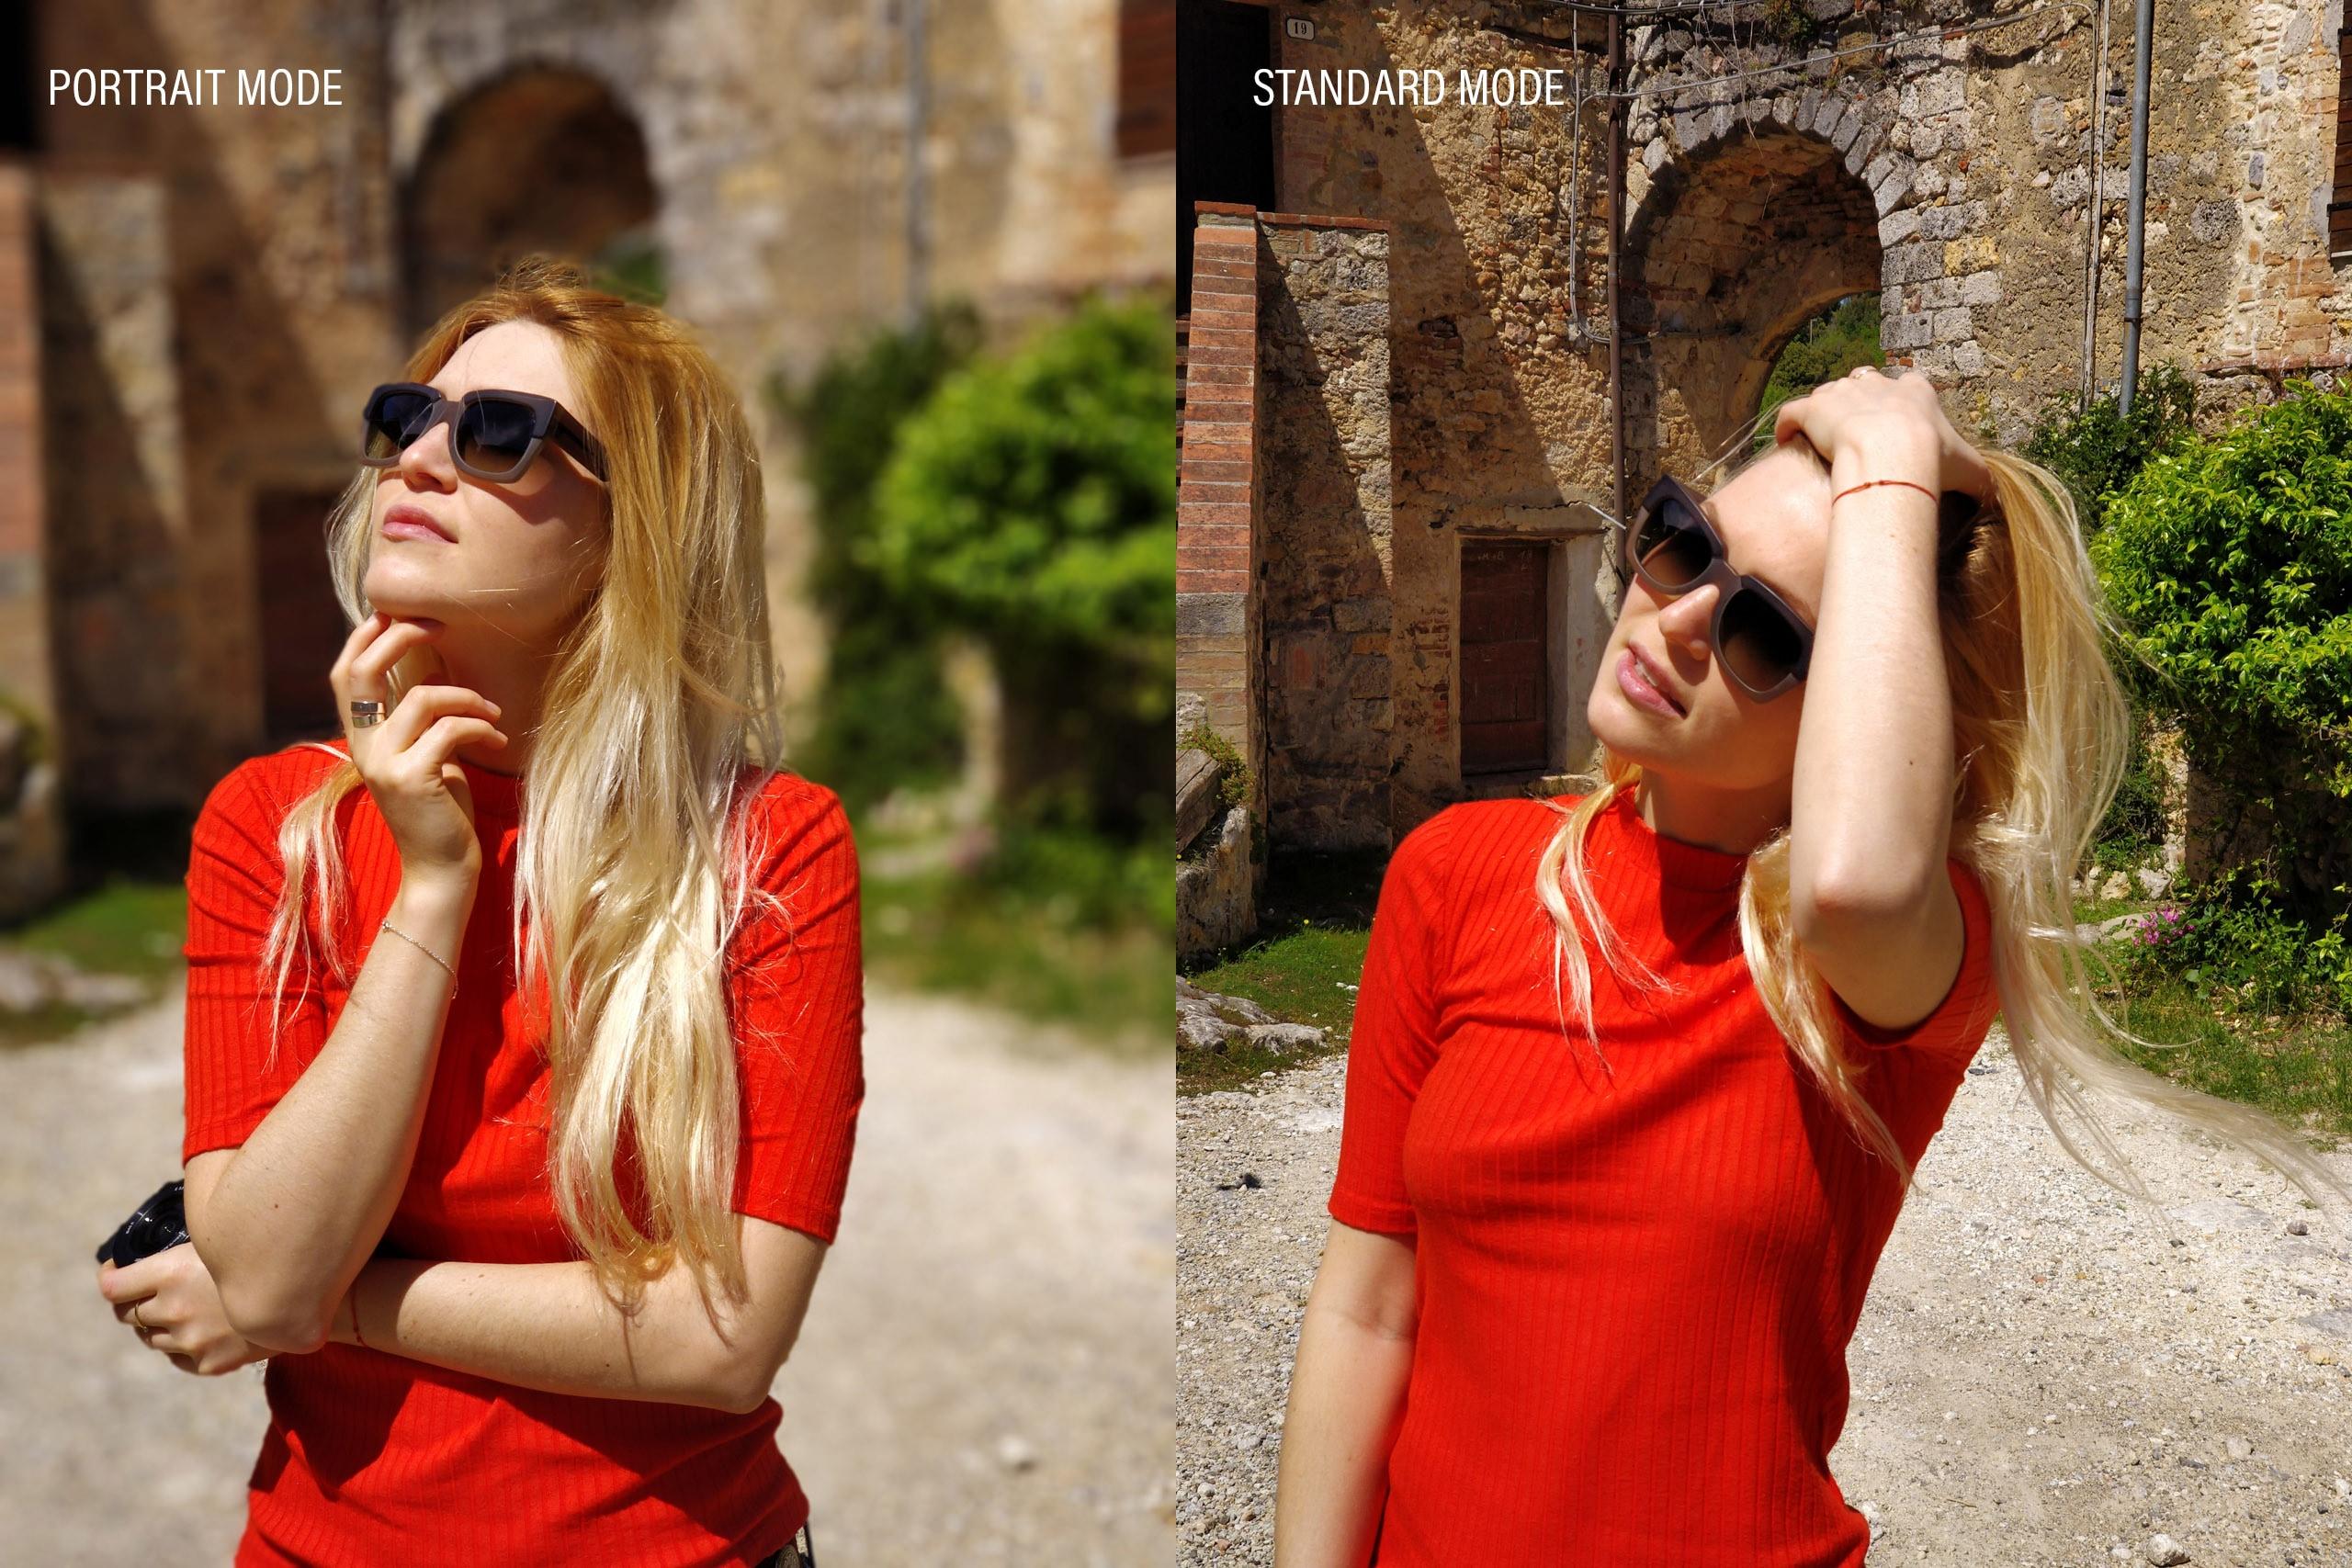 oneplus-5-photo-review-alessandro-michelazzi-portrait-mode-1